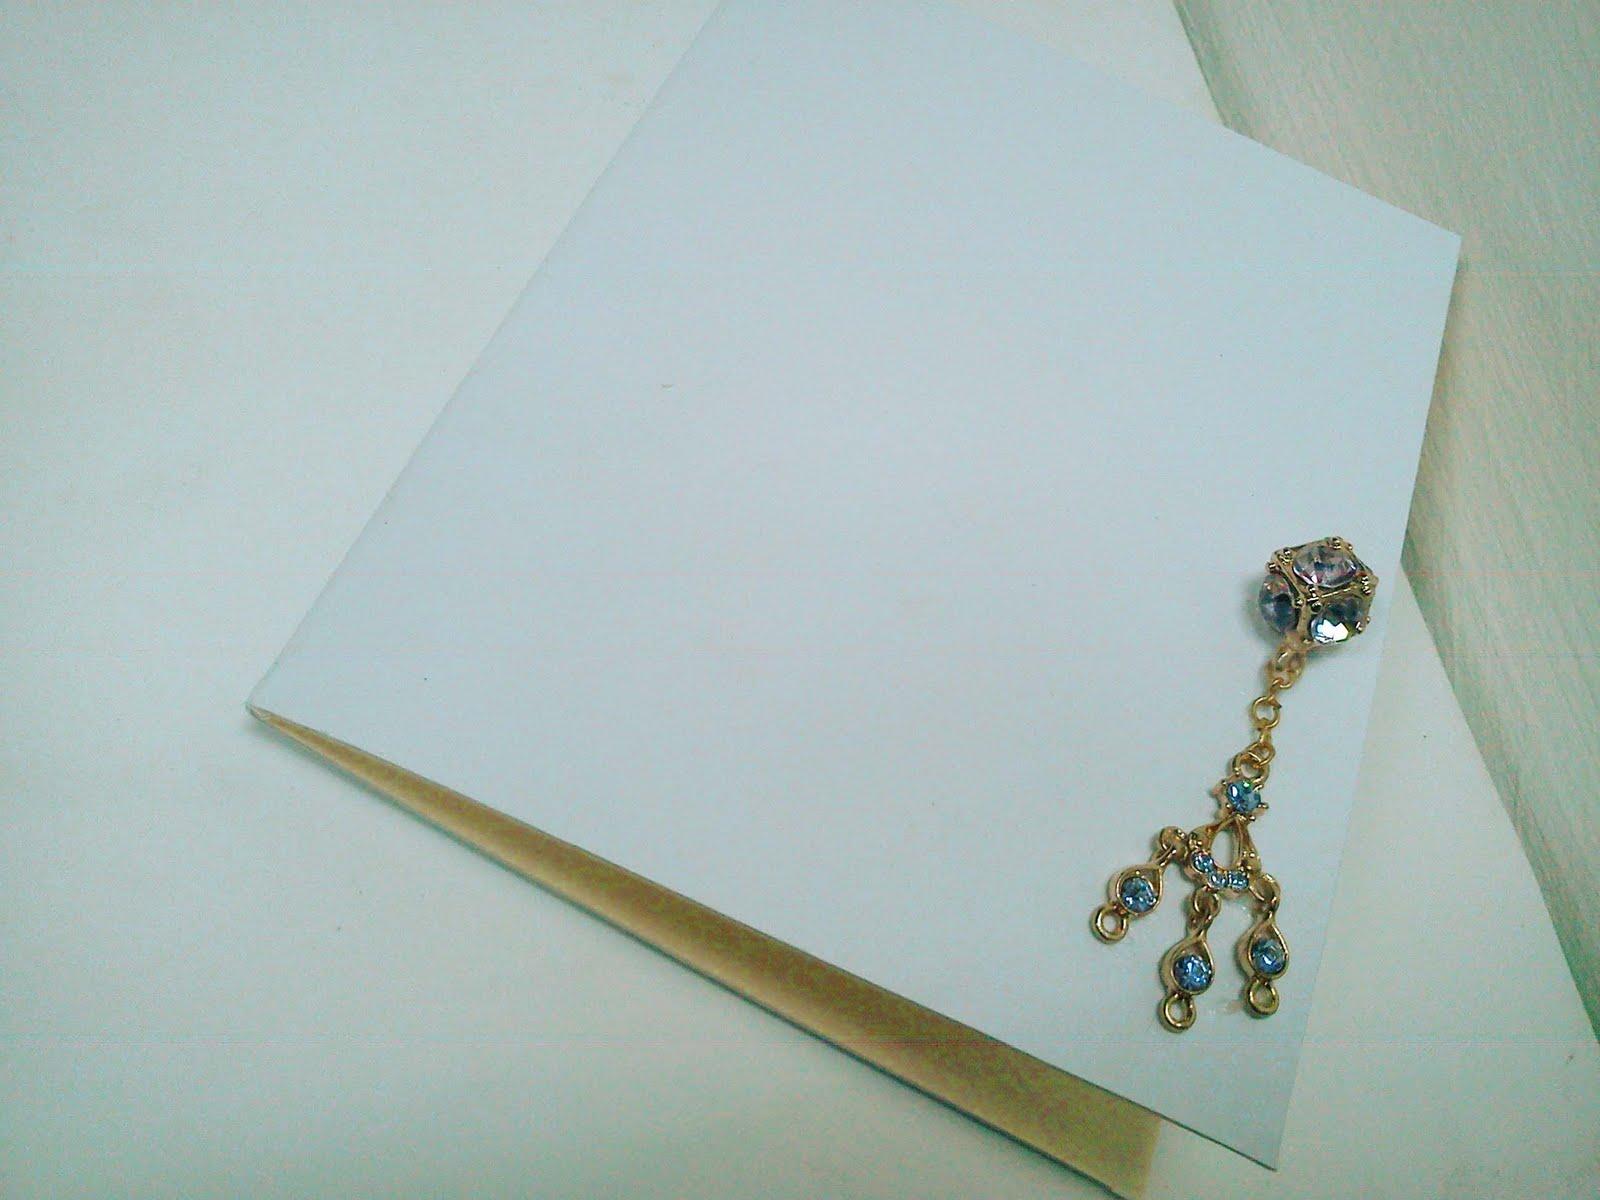 Fadzillah Farewell Handmade Greeting Card